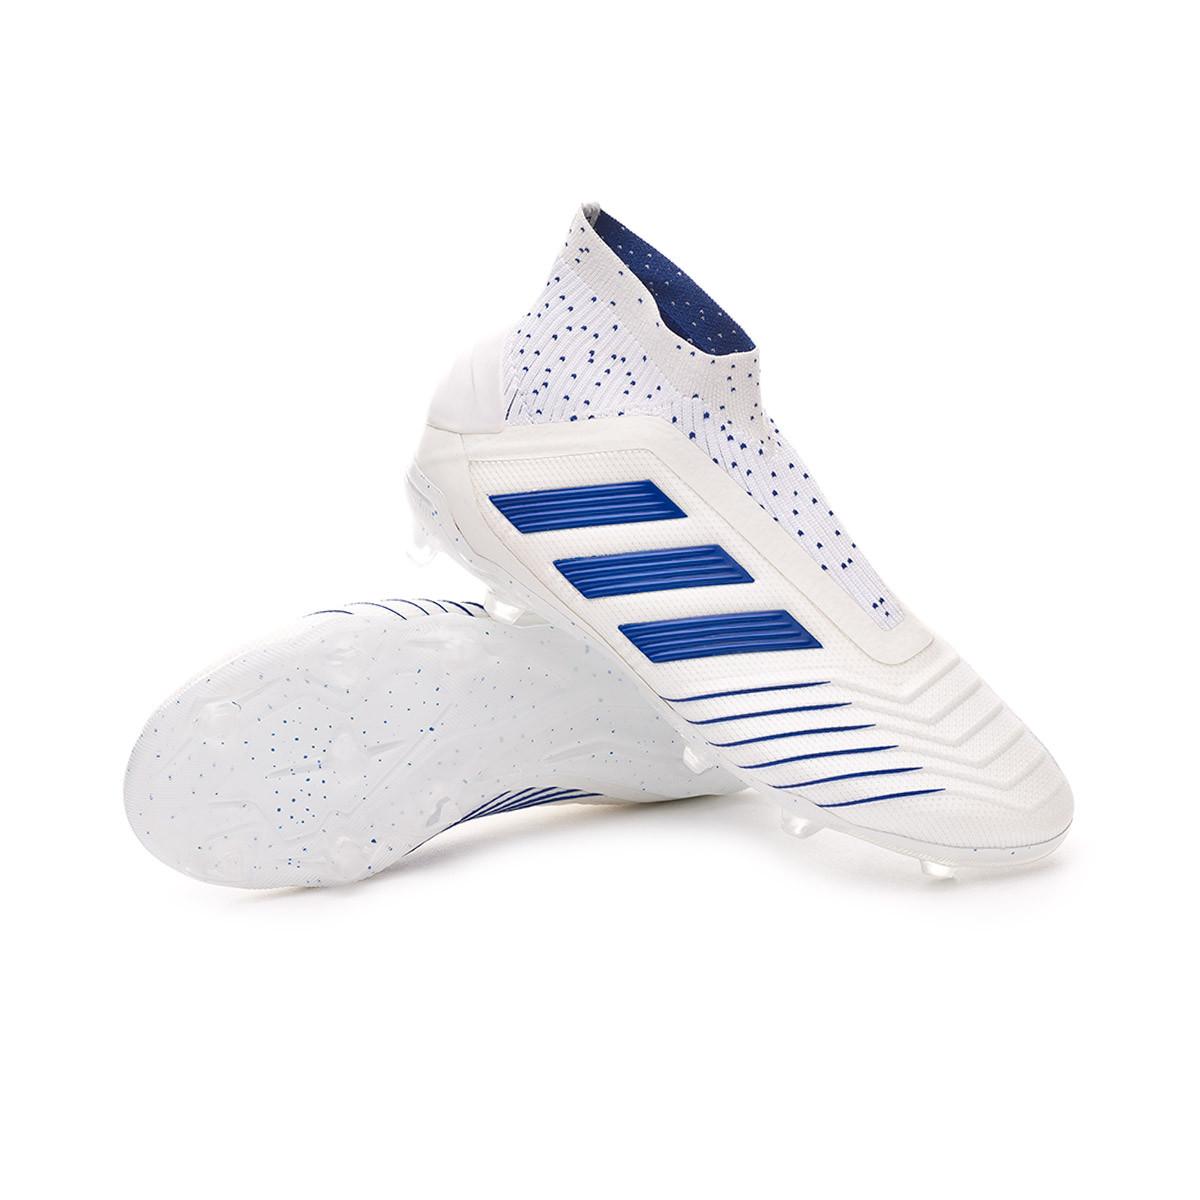 super specials differently best wholesaler adidas Kids Predator 19+ FG Football Boots